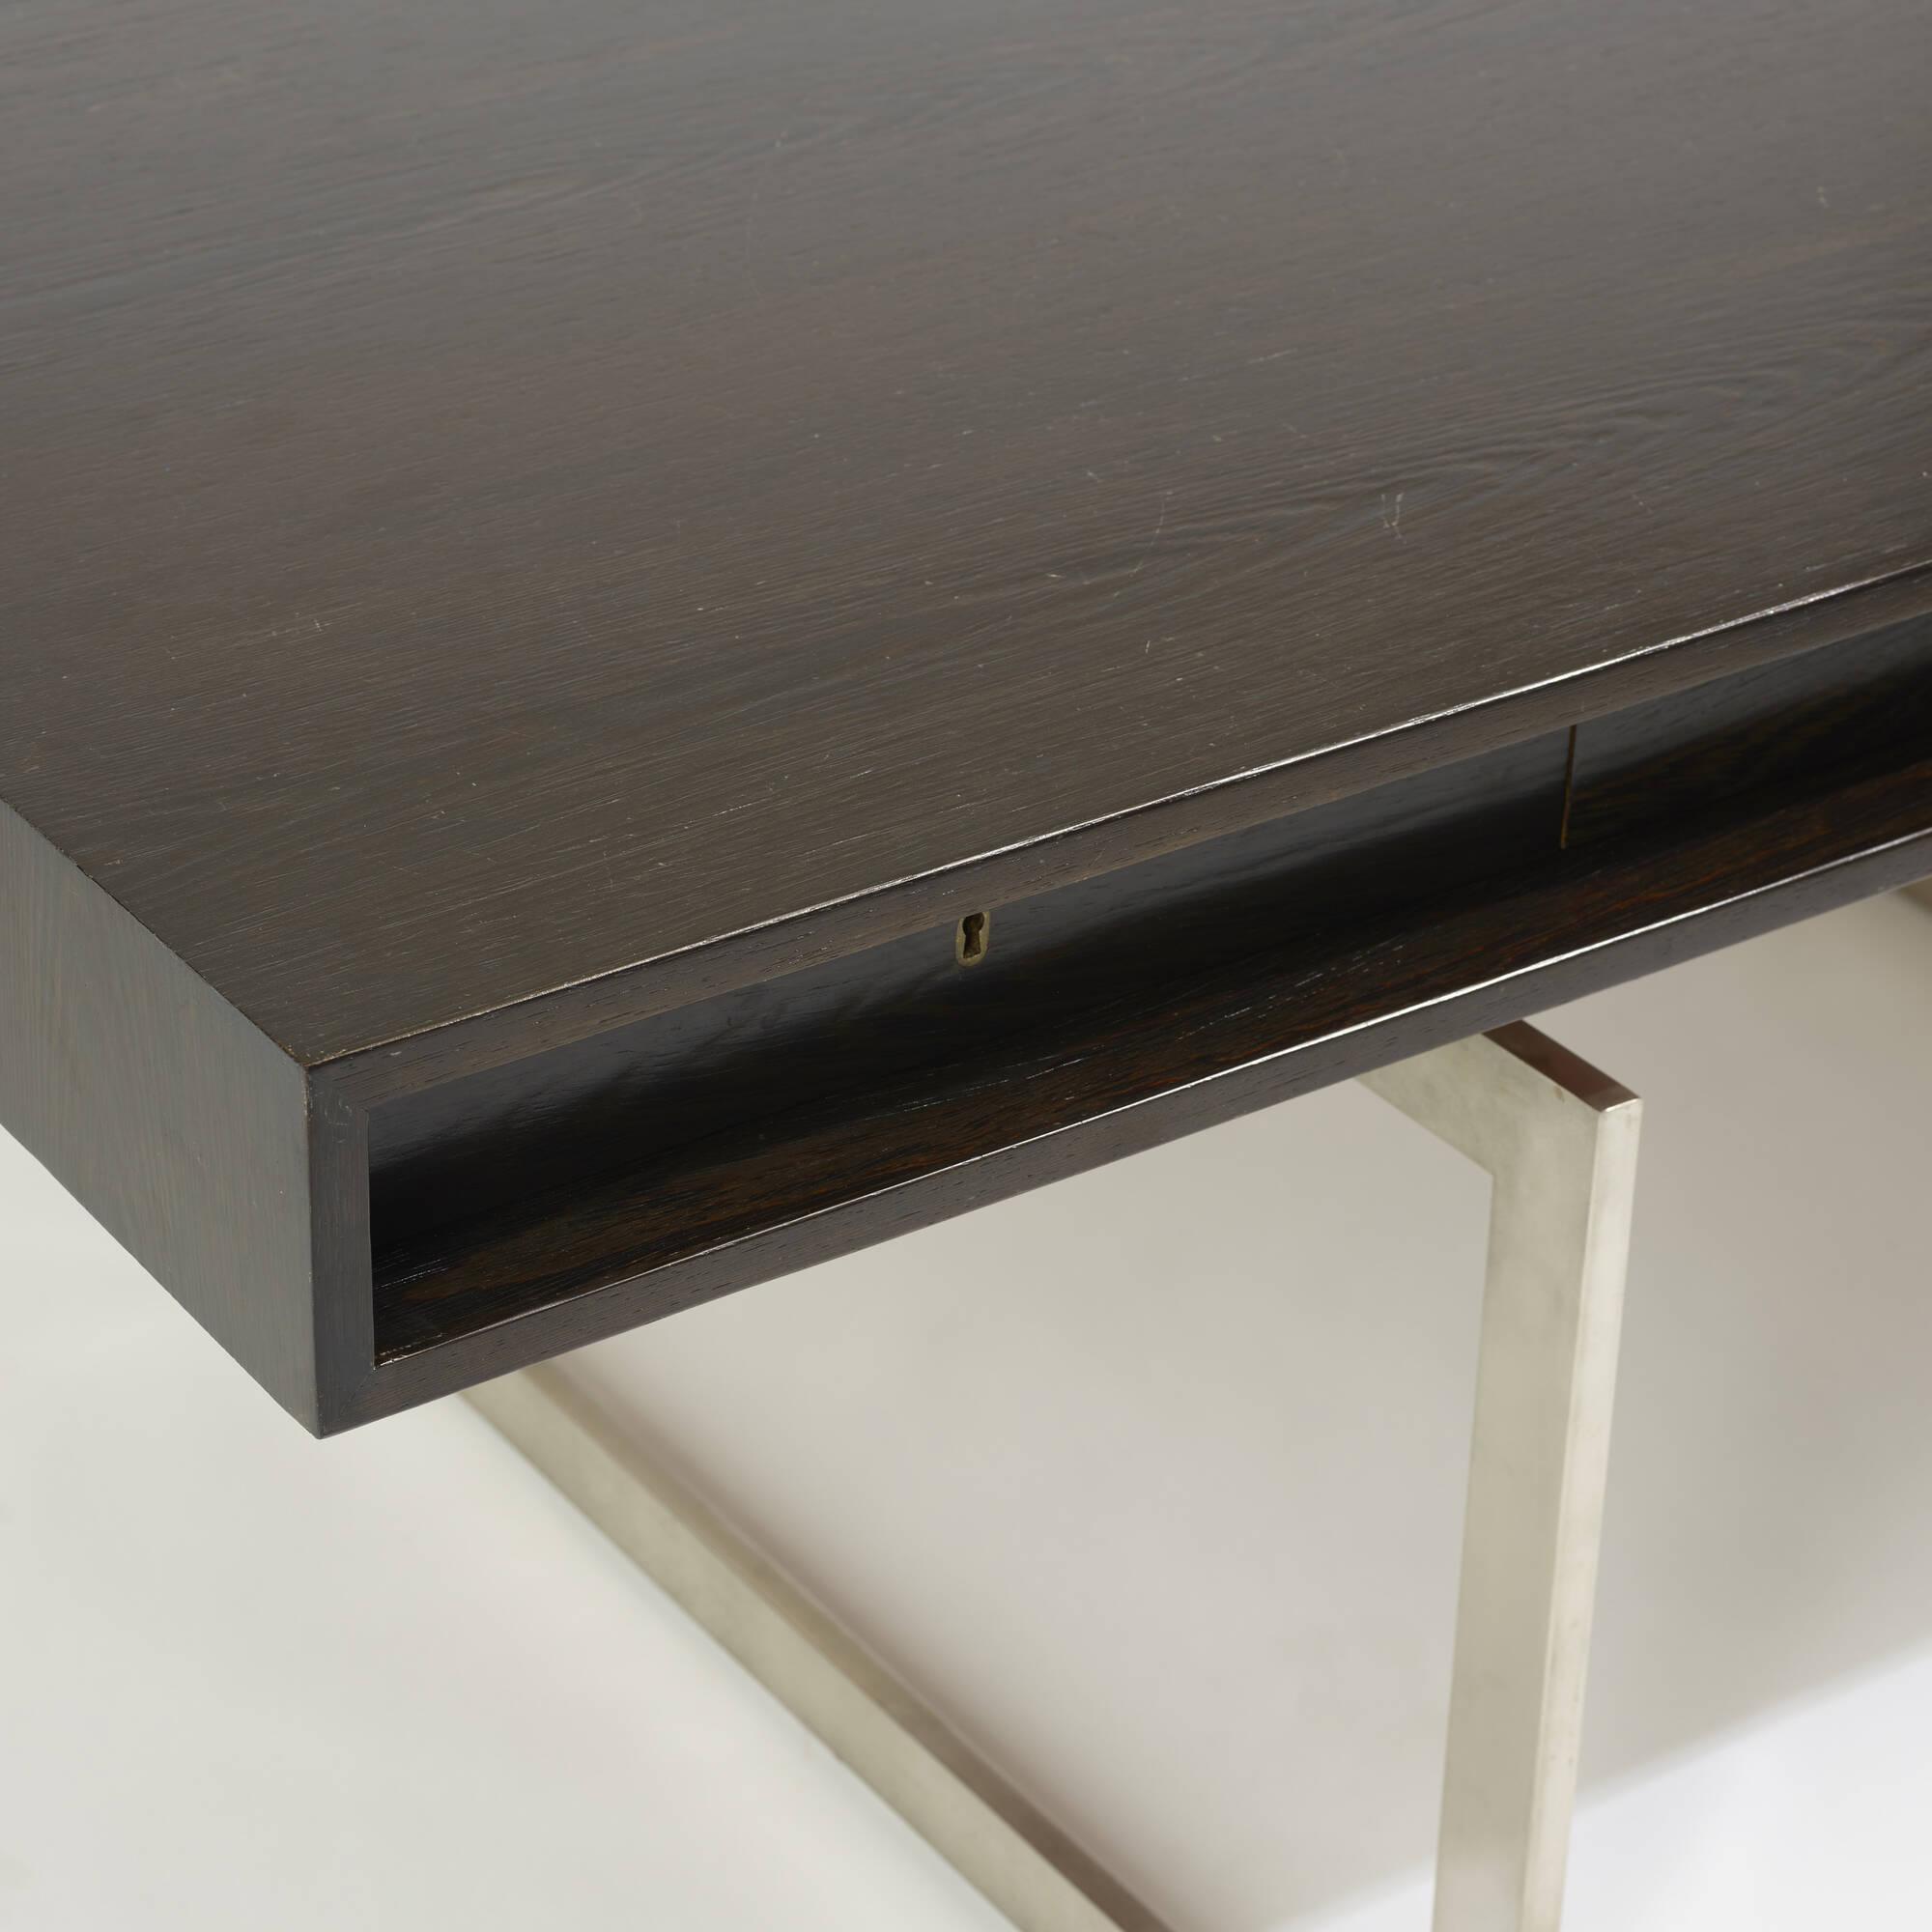 341: Bodil Kjaer / desk (3 of 3)